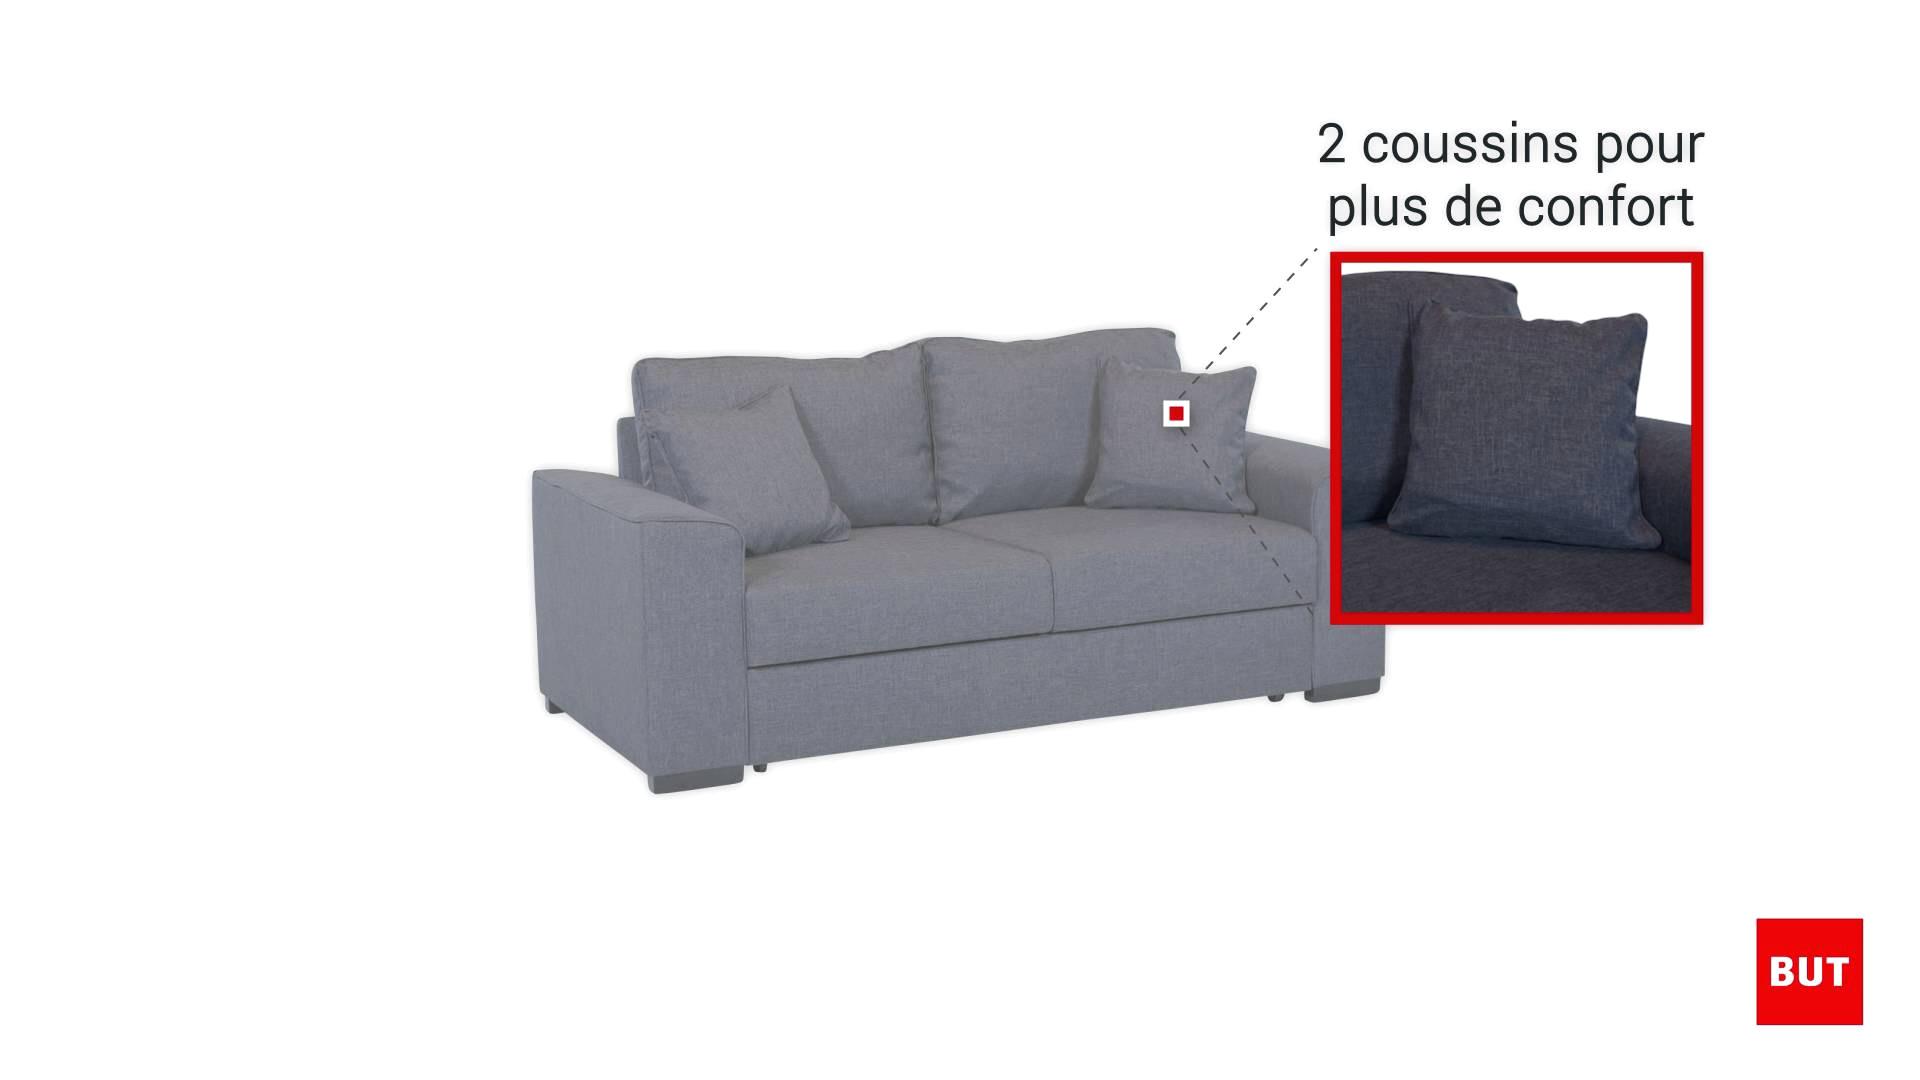 74 impressionnant photos de fabriquer un canap avec un. Black Bedroom Furniture Sets. Home Design Ideas